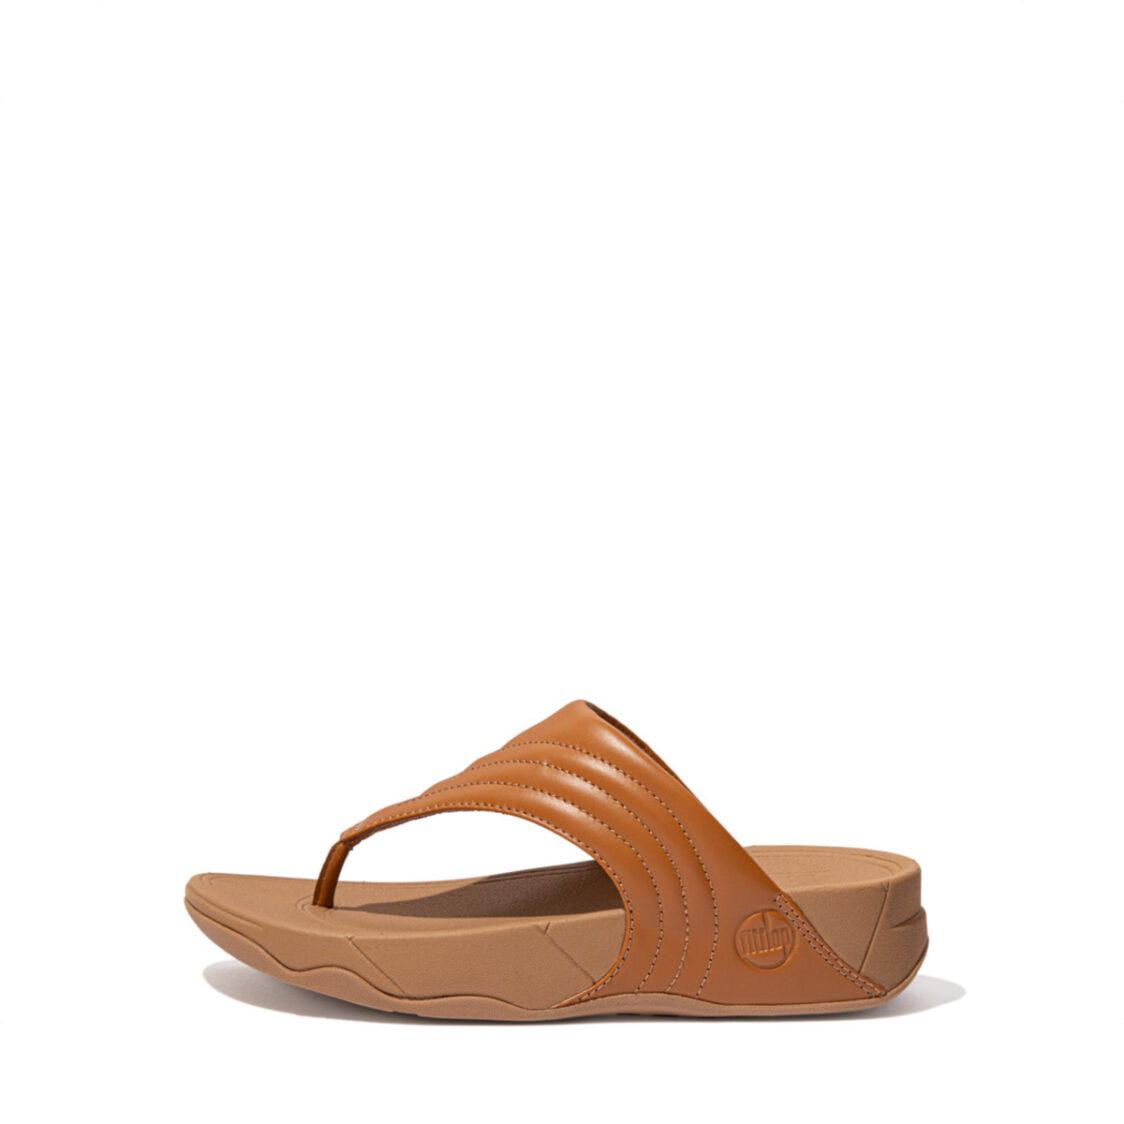 Fitflop Walkstar Leather Toe-Post Sandals Light Tan Dx5-592